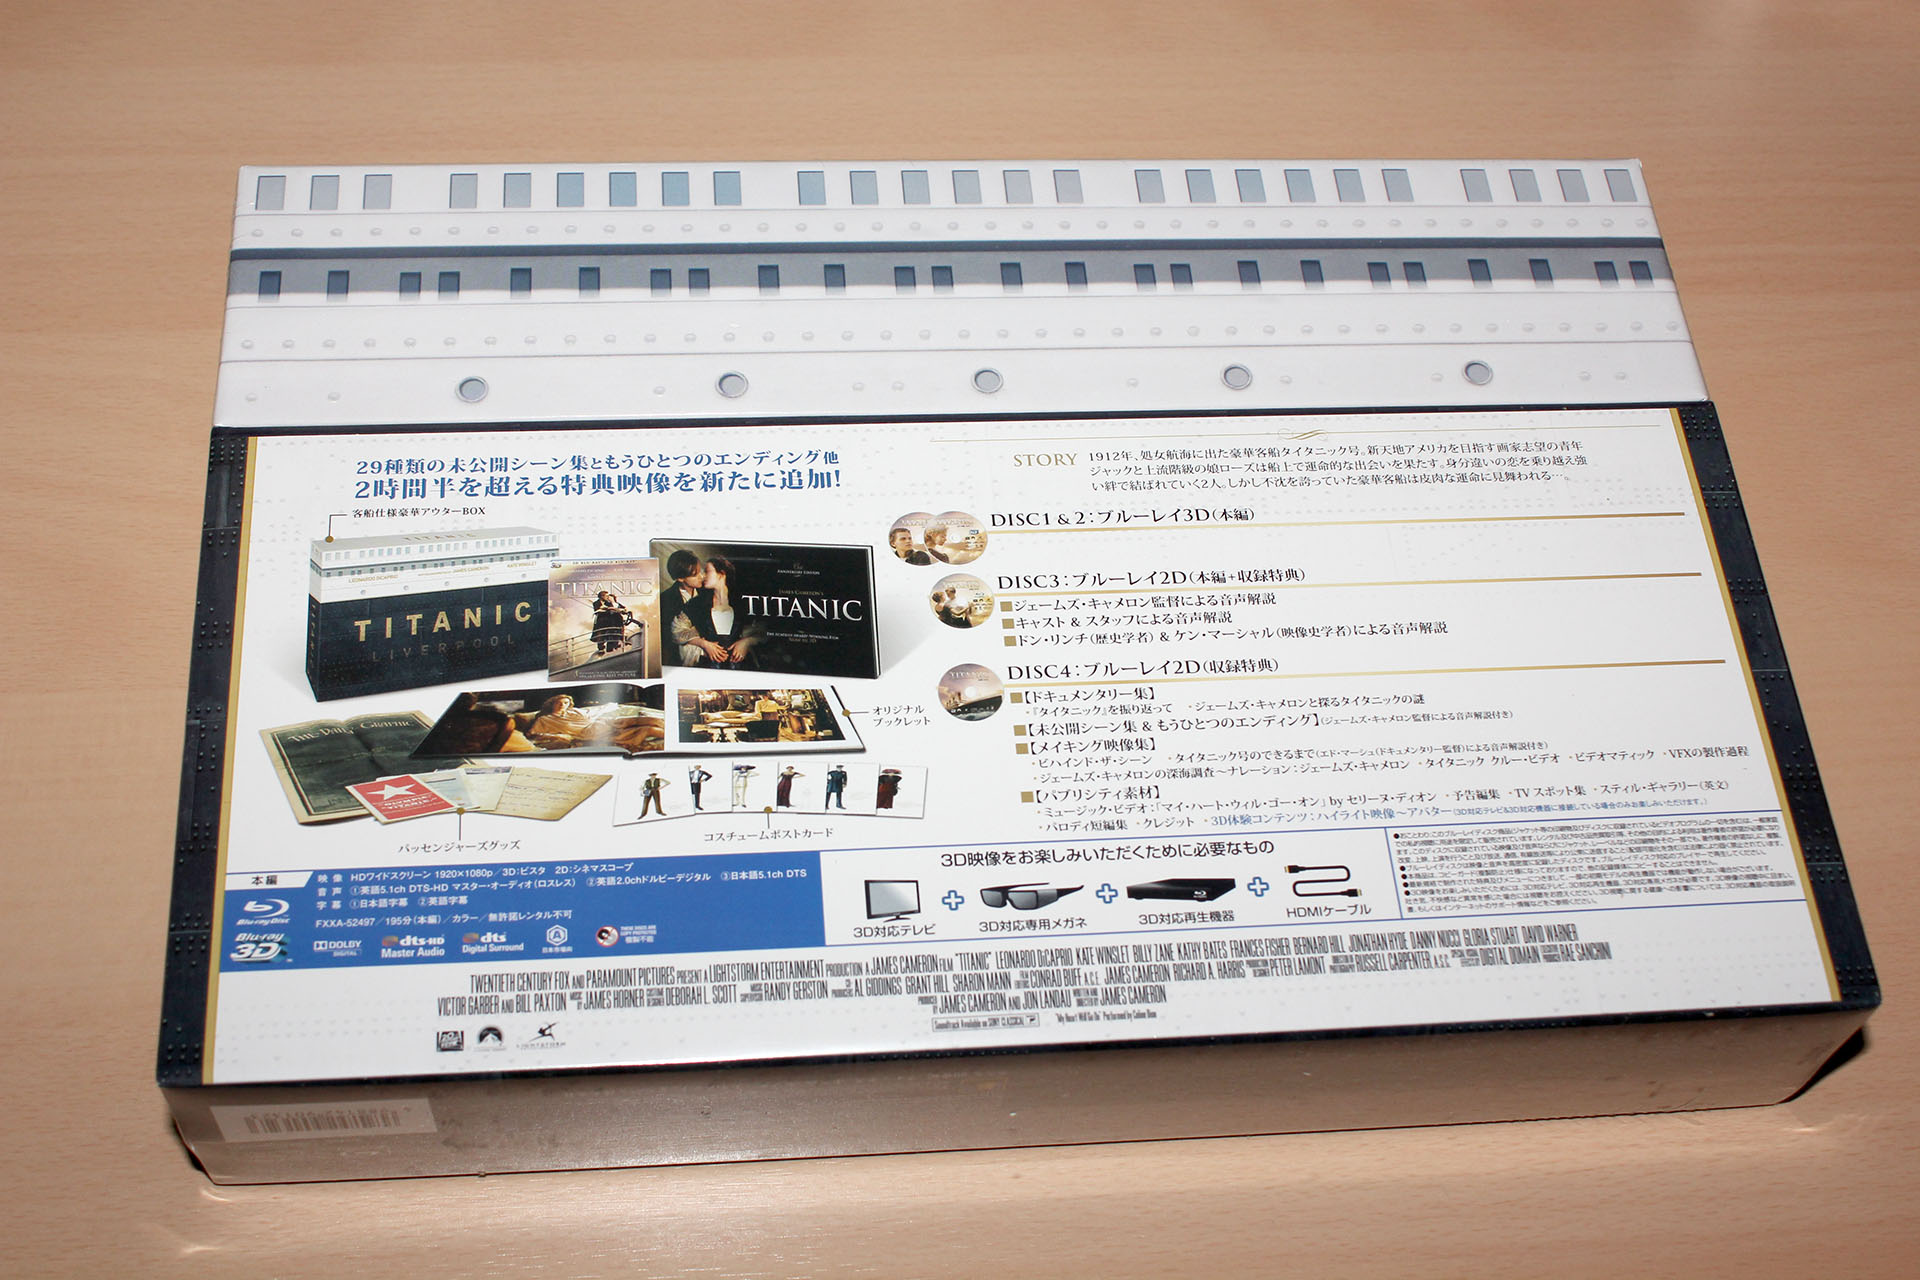 2012-09-28-TITANIC_BD-02.JPG